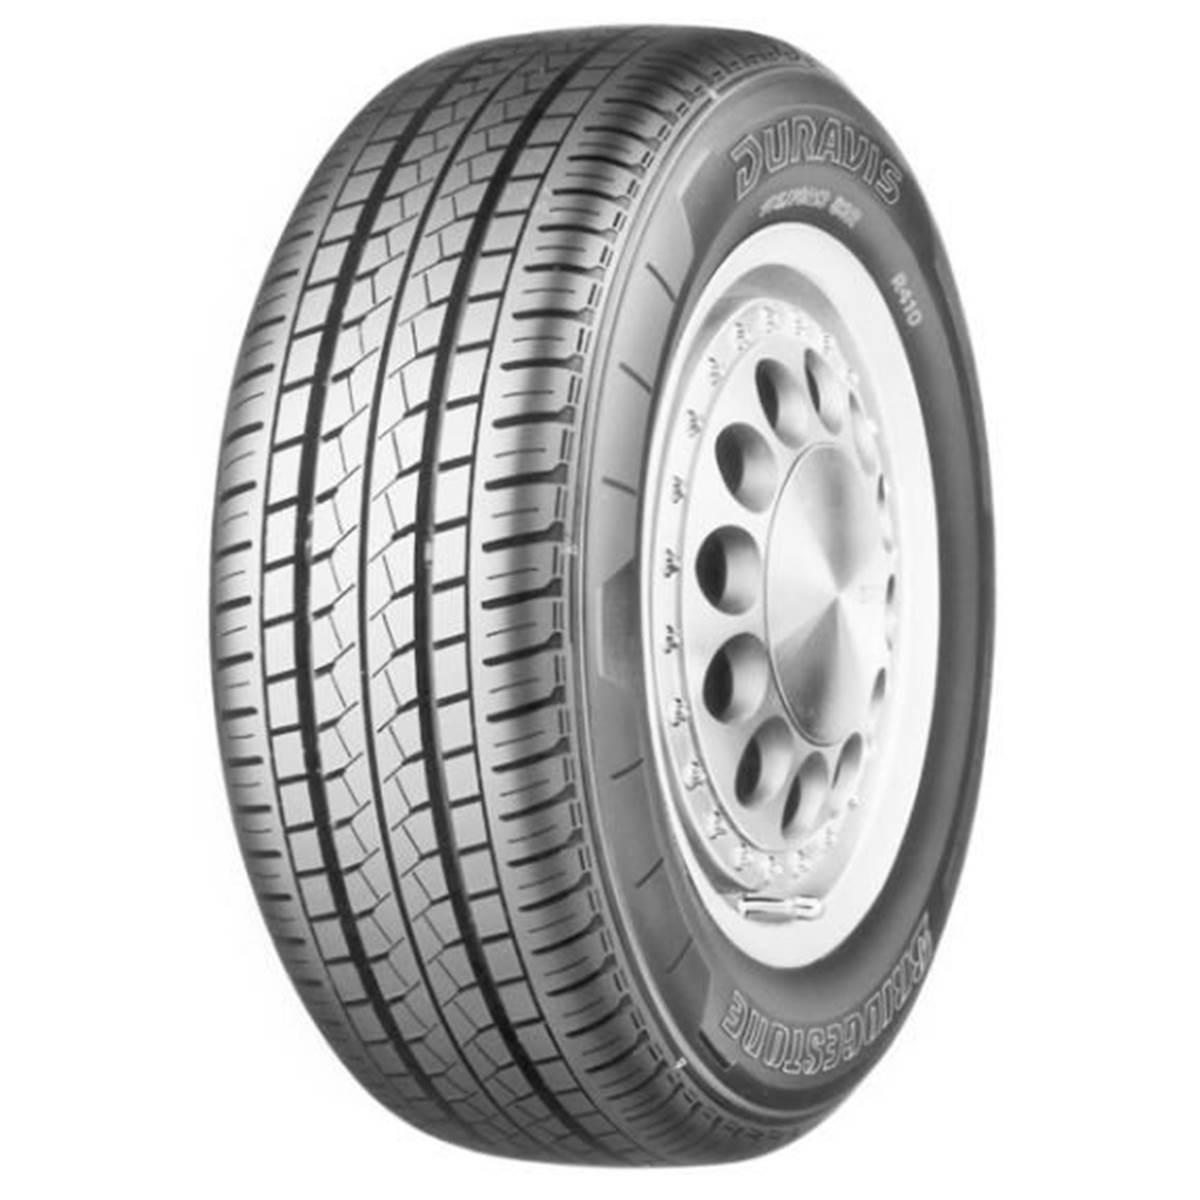 Pneu Camionnette Bridgestone 215/65R15 104T Duravis R410